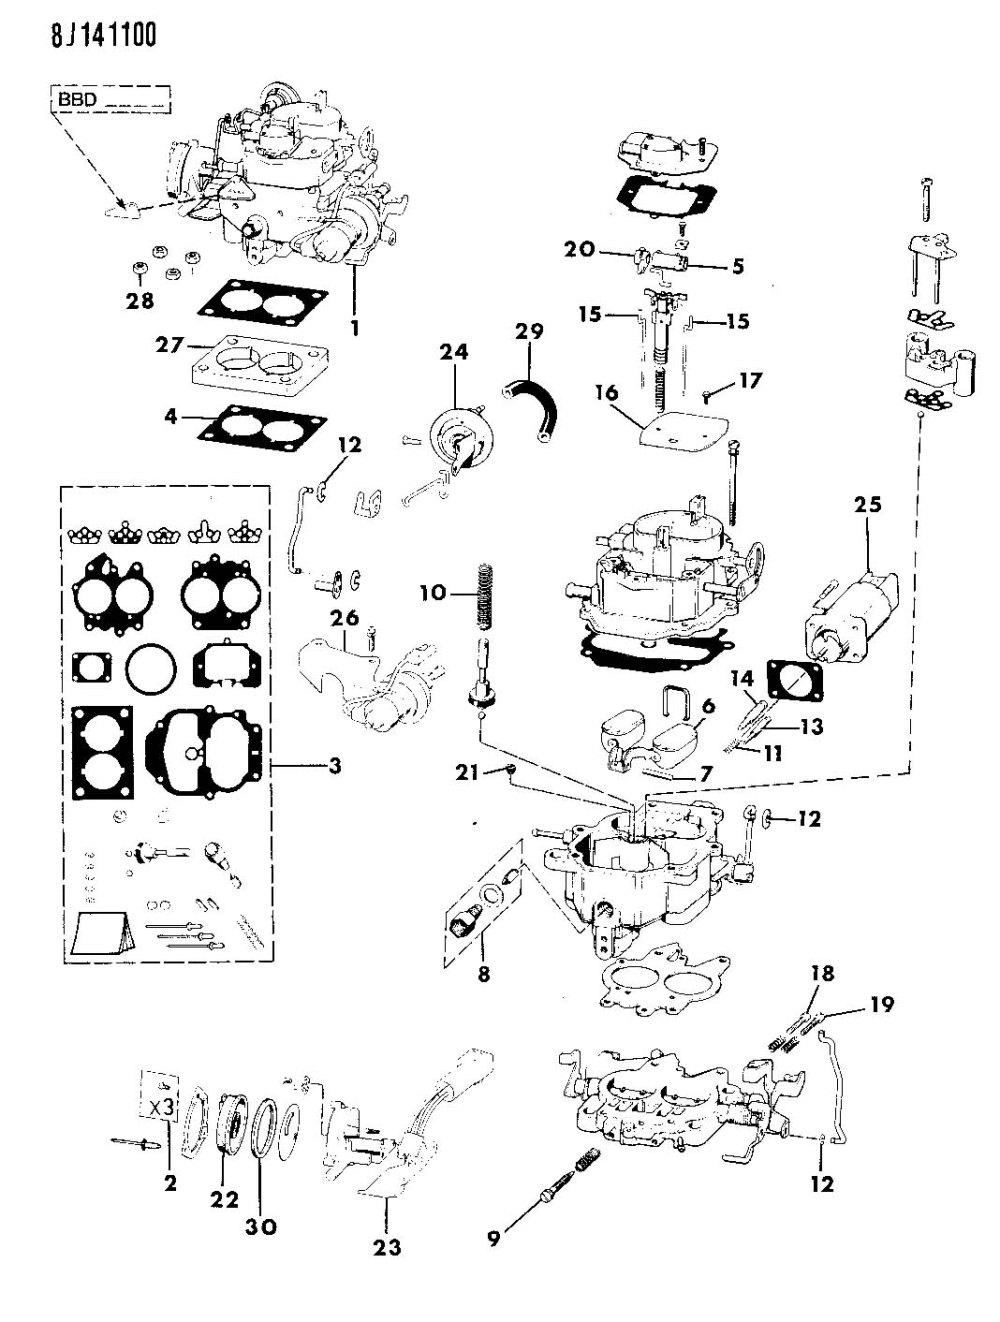 medium resolution of 1987 jeep wrangler 4 2l engine diagram 1987 free engine kotaksurat co 1990 jeep wrangler parts 1988